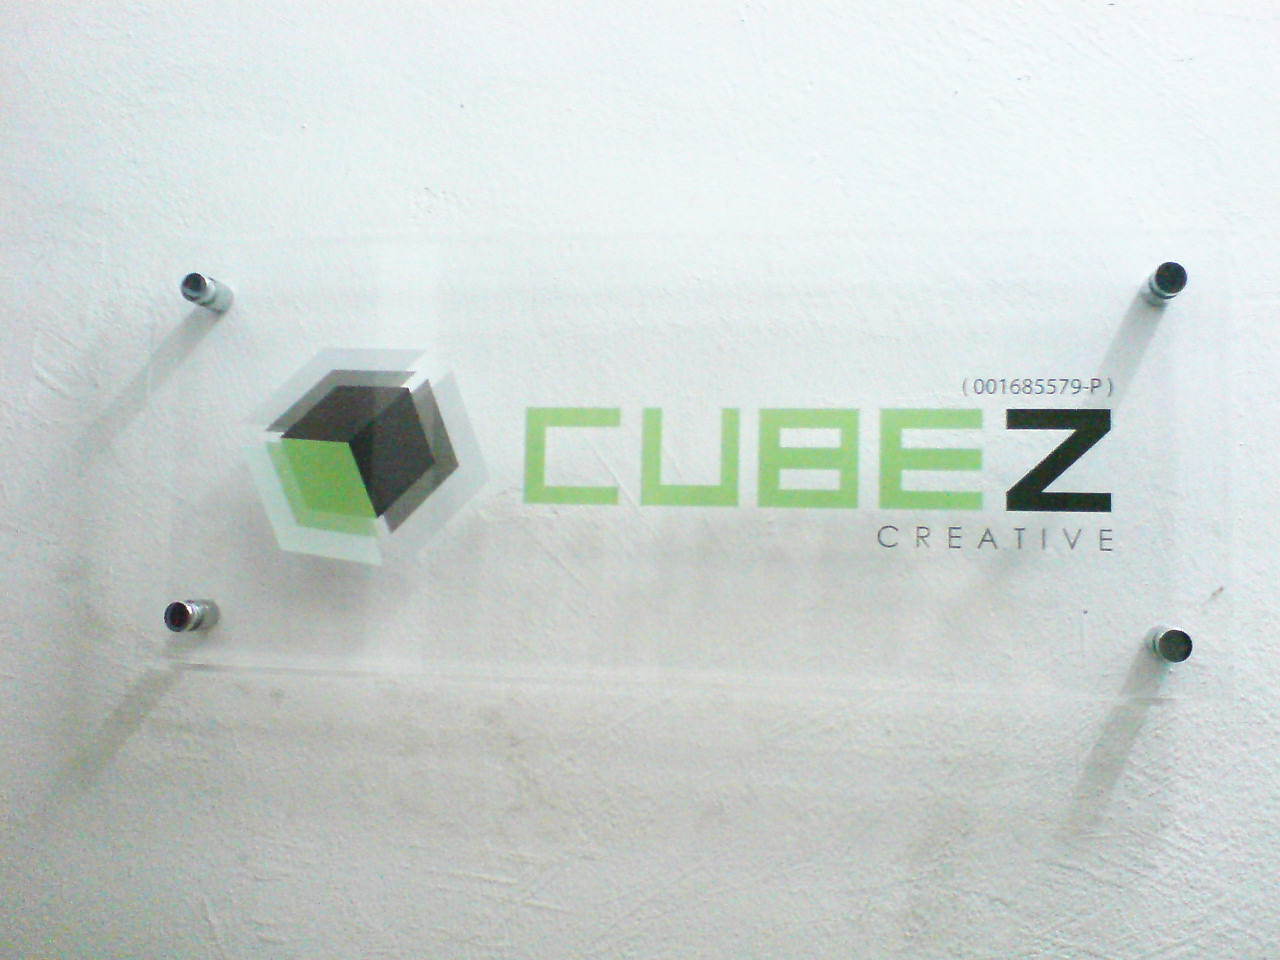 Acrylic signage with bolt screw